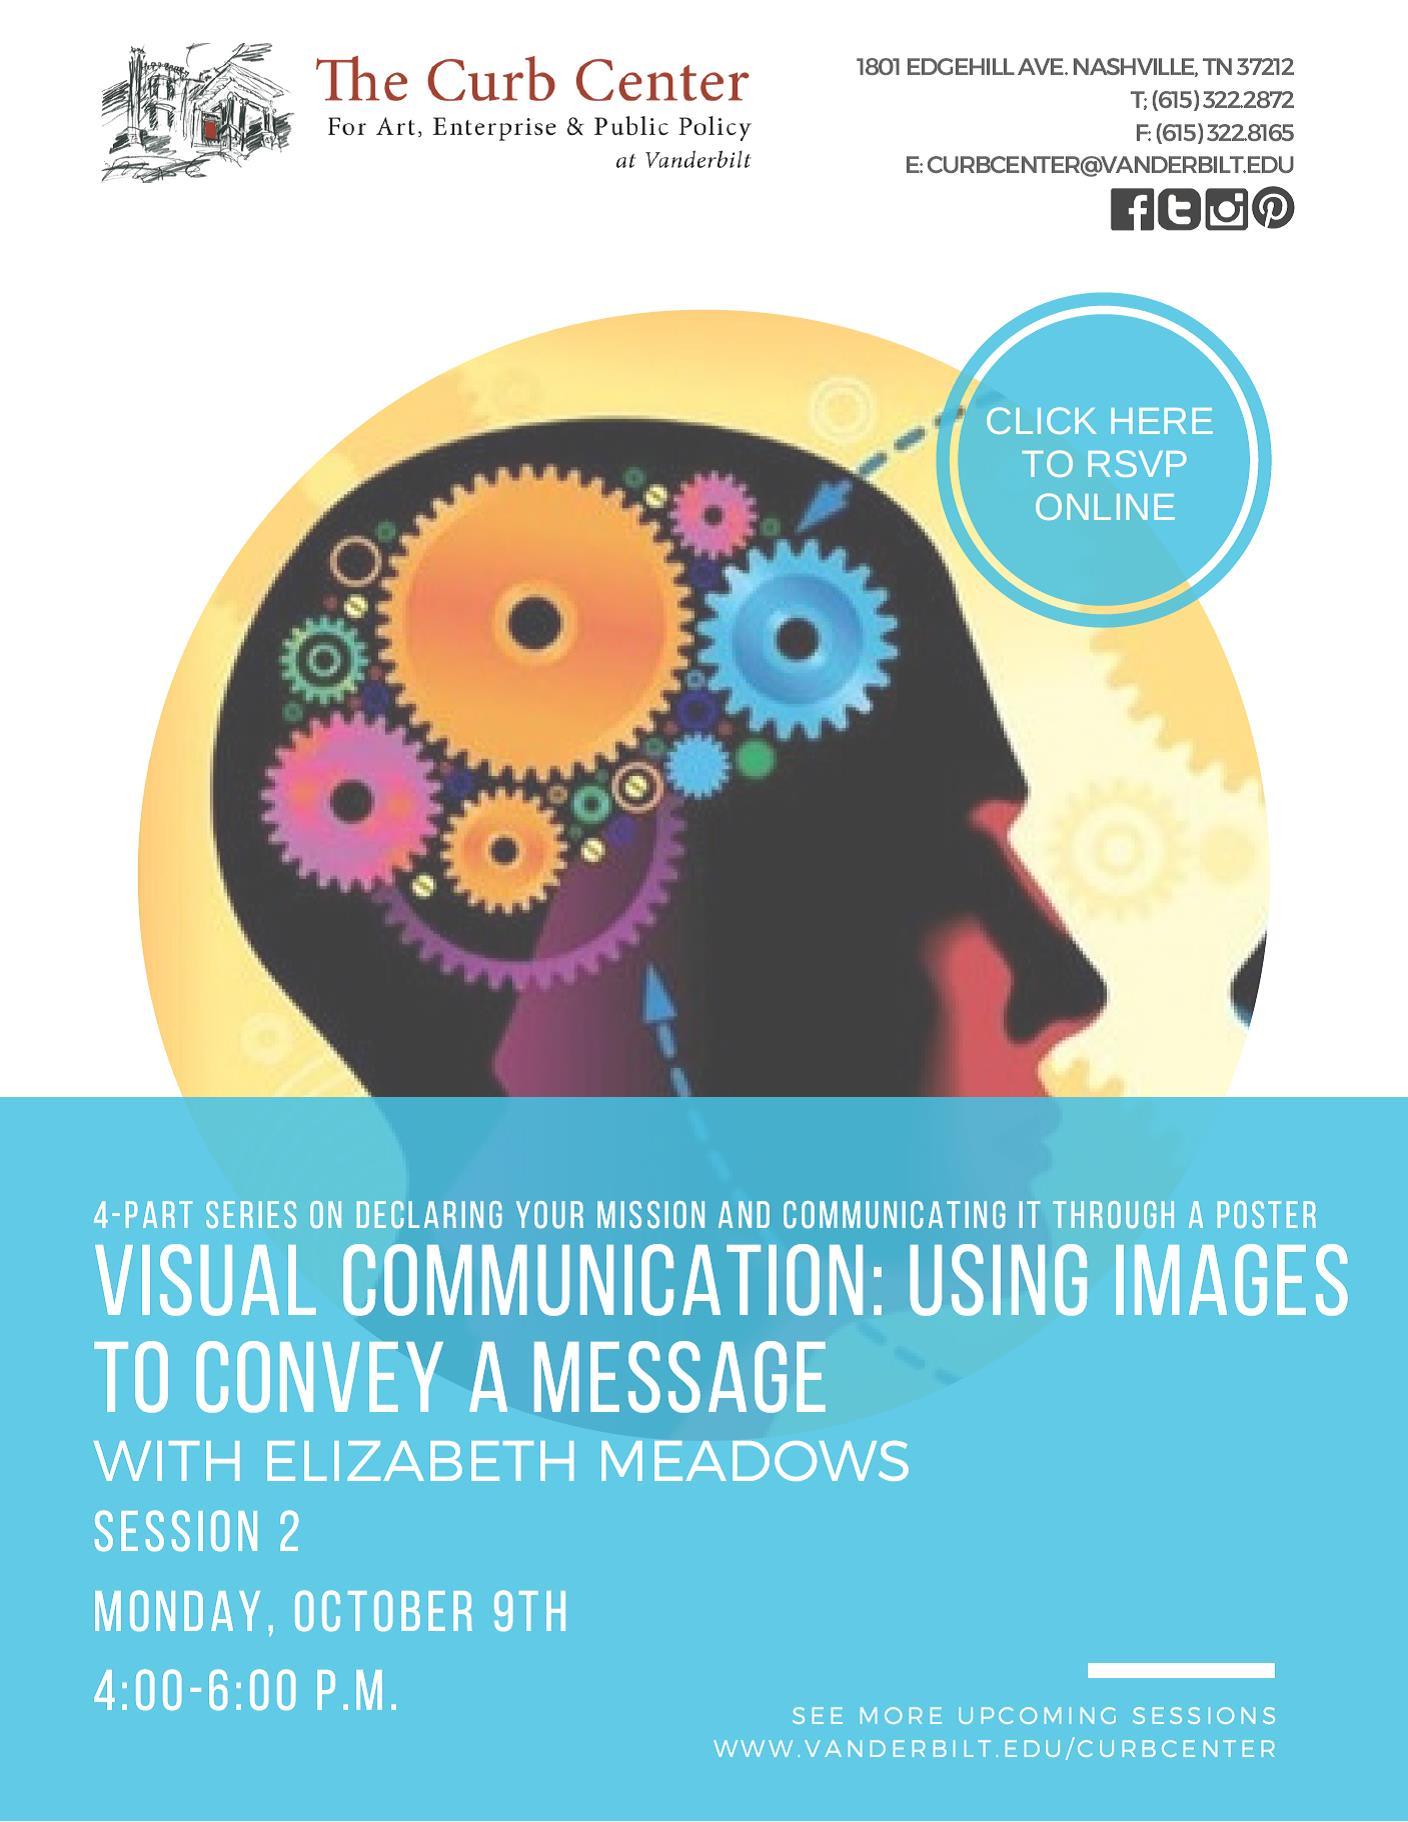 Visual communicatoin